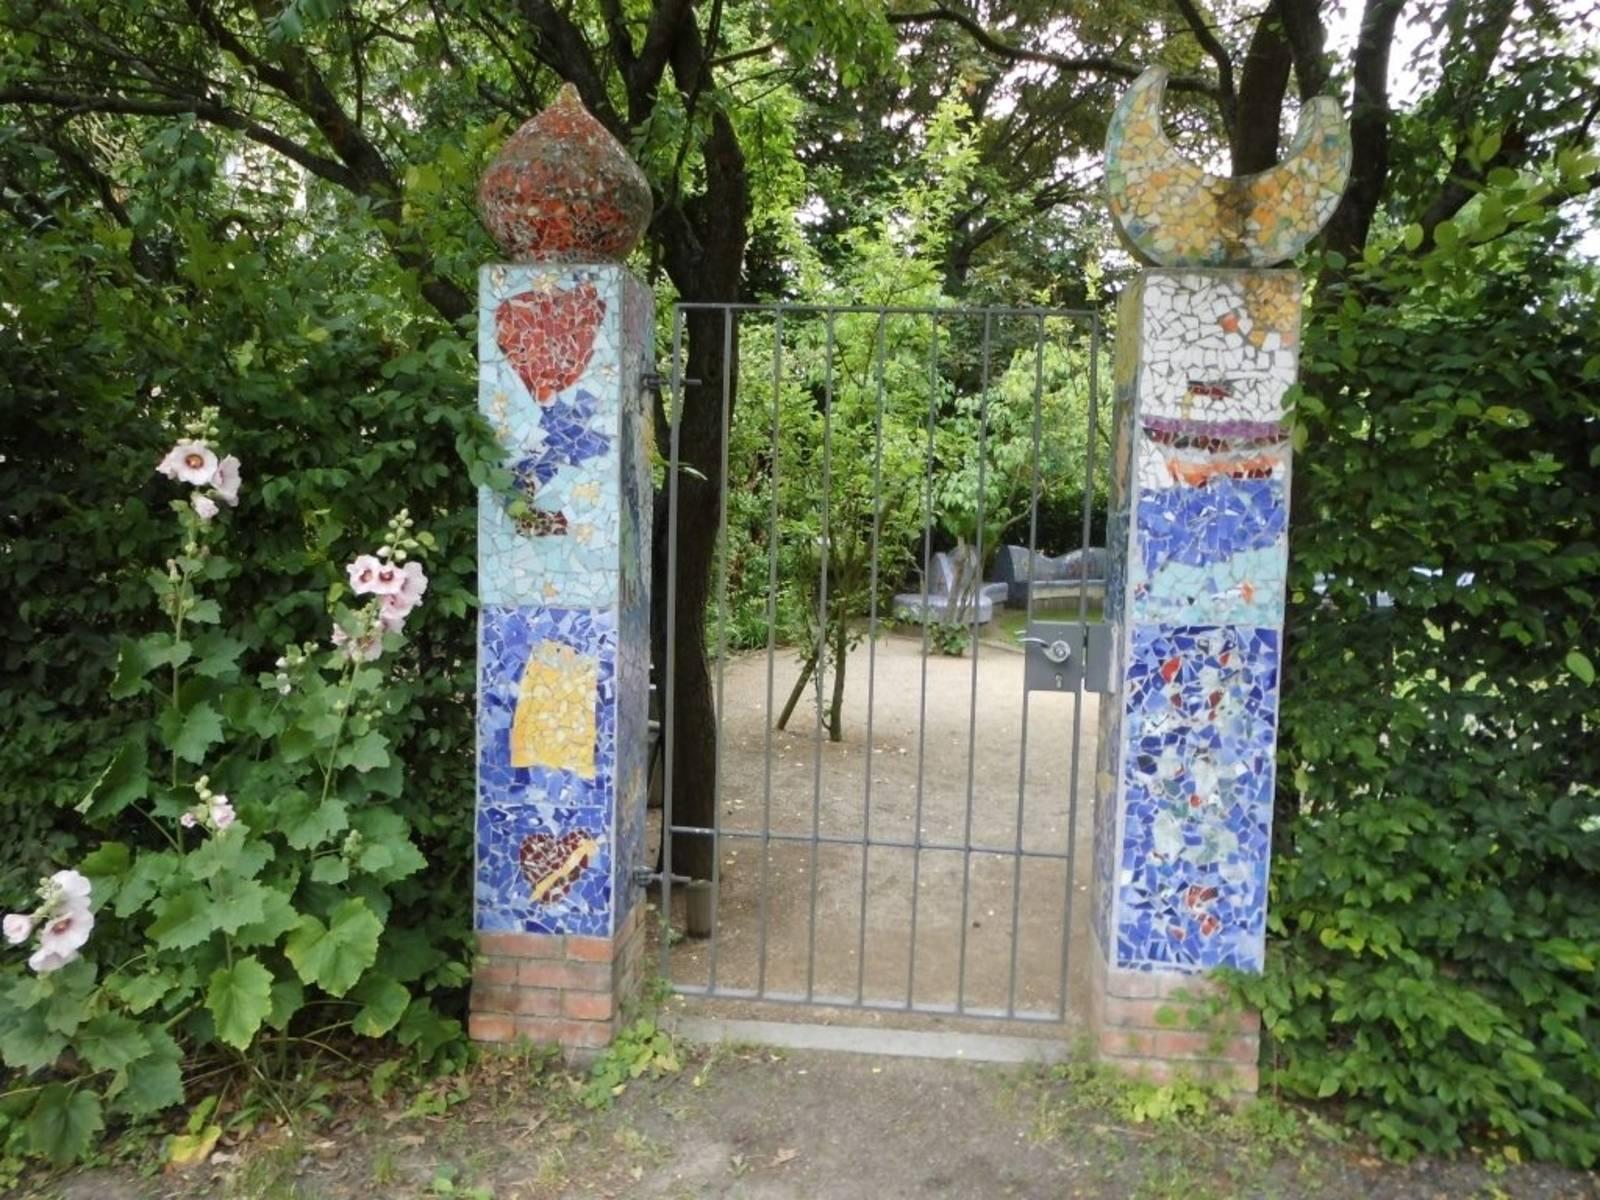 Eingang zum TeeGarten in Hainholz